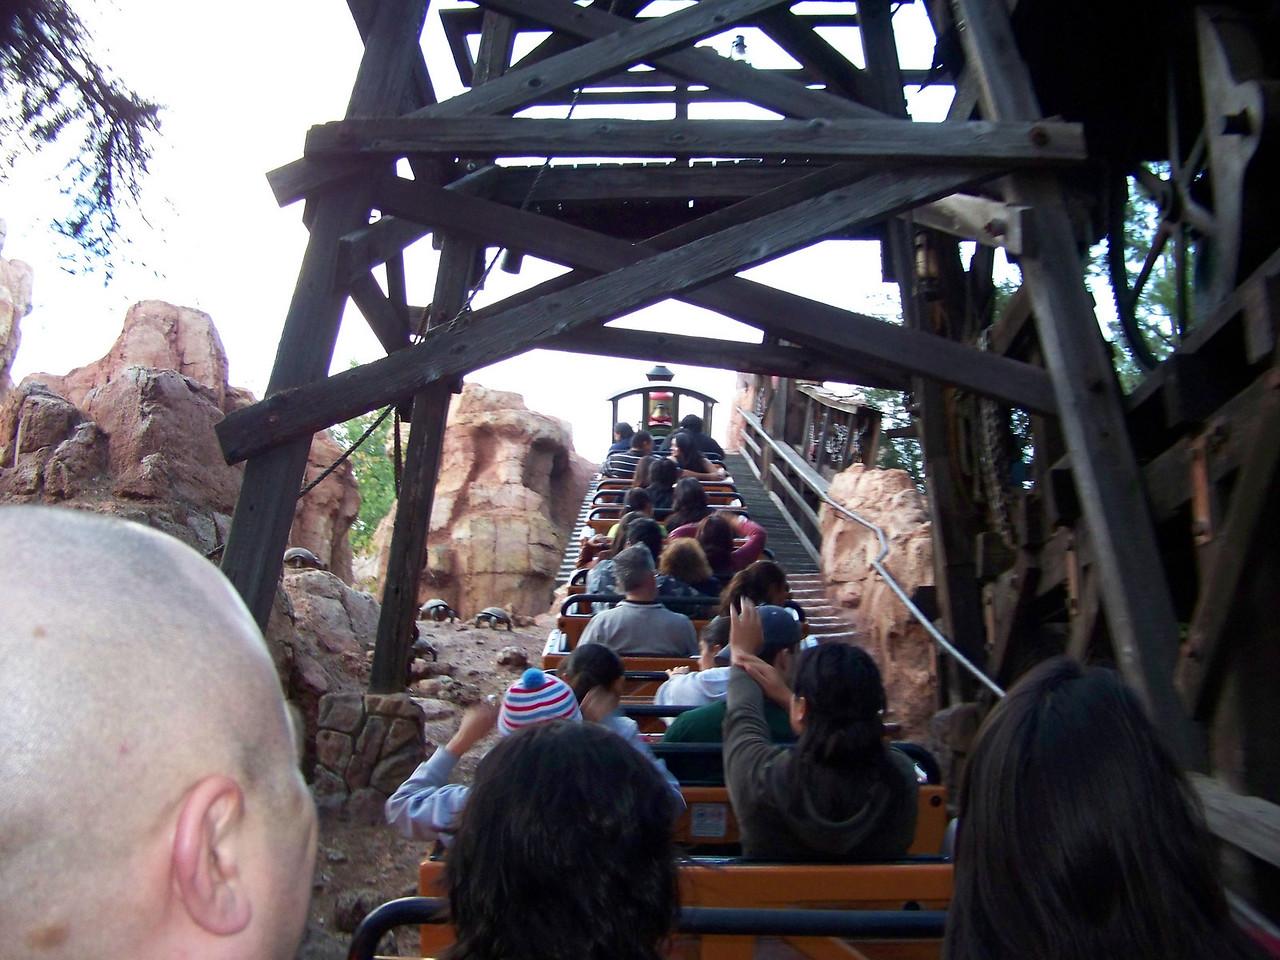 Disneyland - Big Thunder Mountain